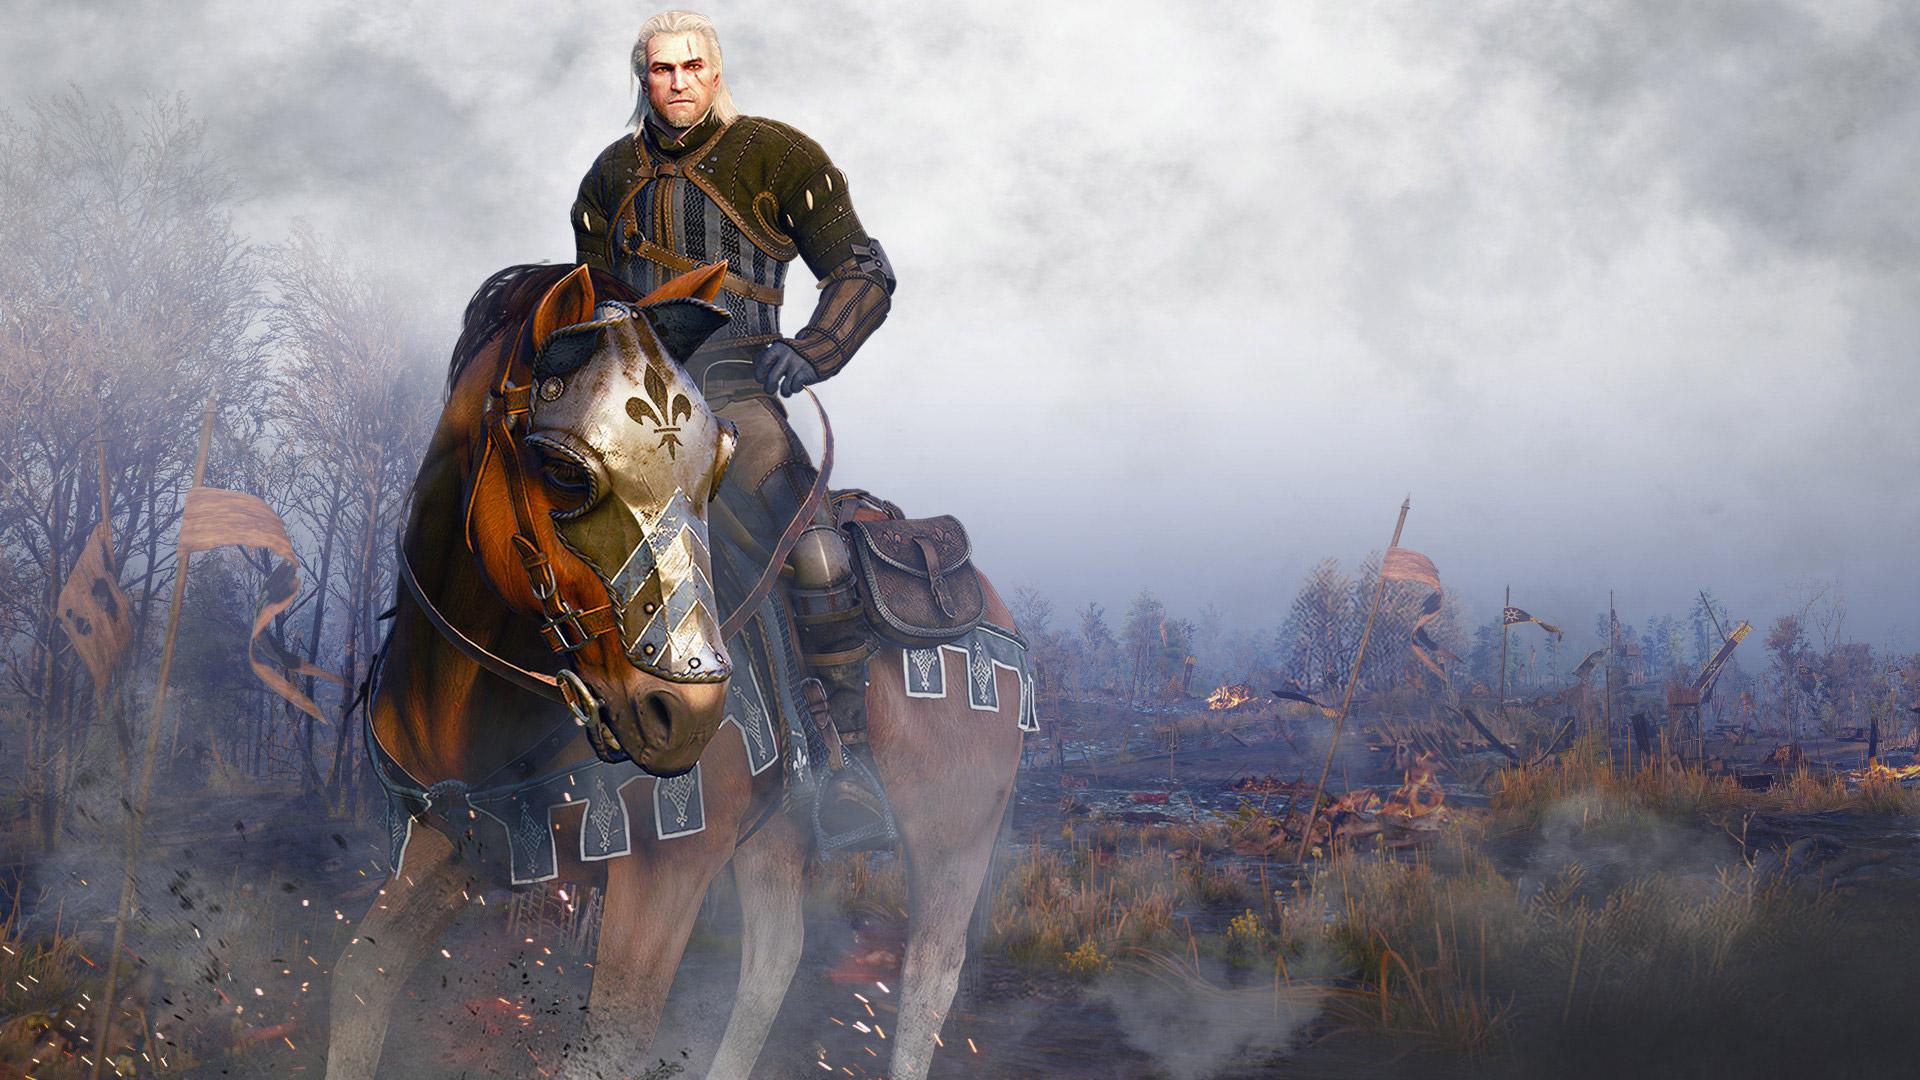 Geralt riding Roach in The Witcher 3: Wild Hunt